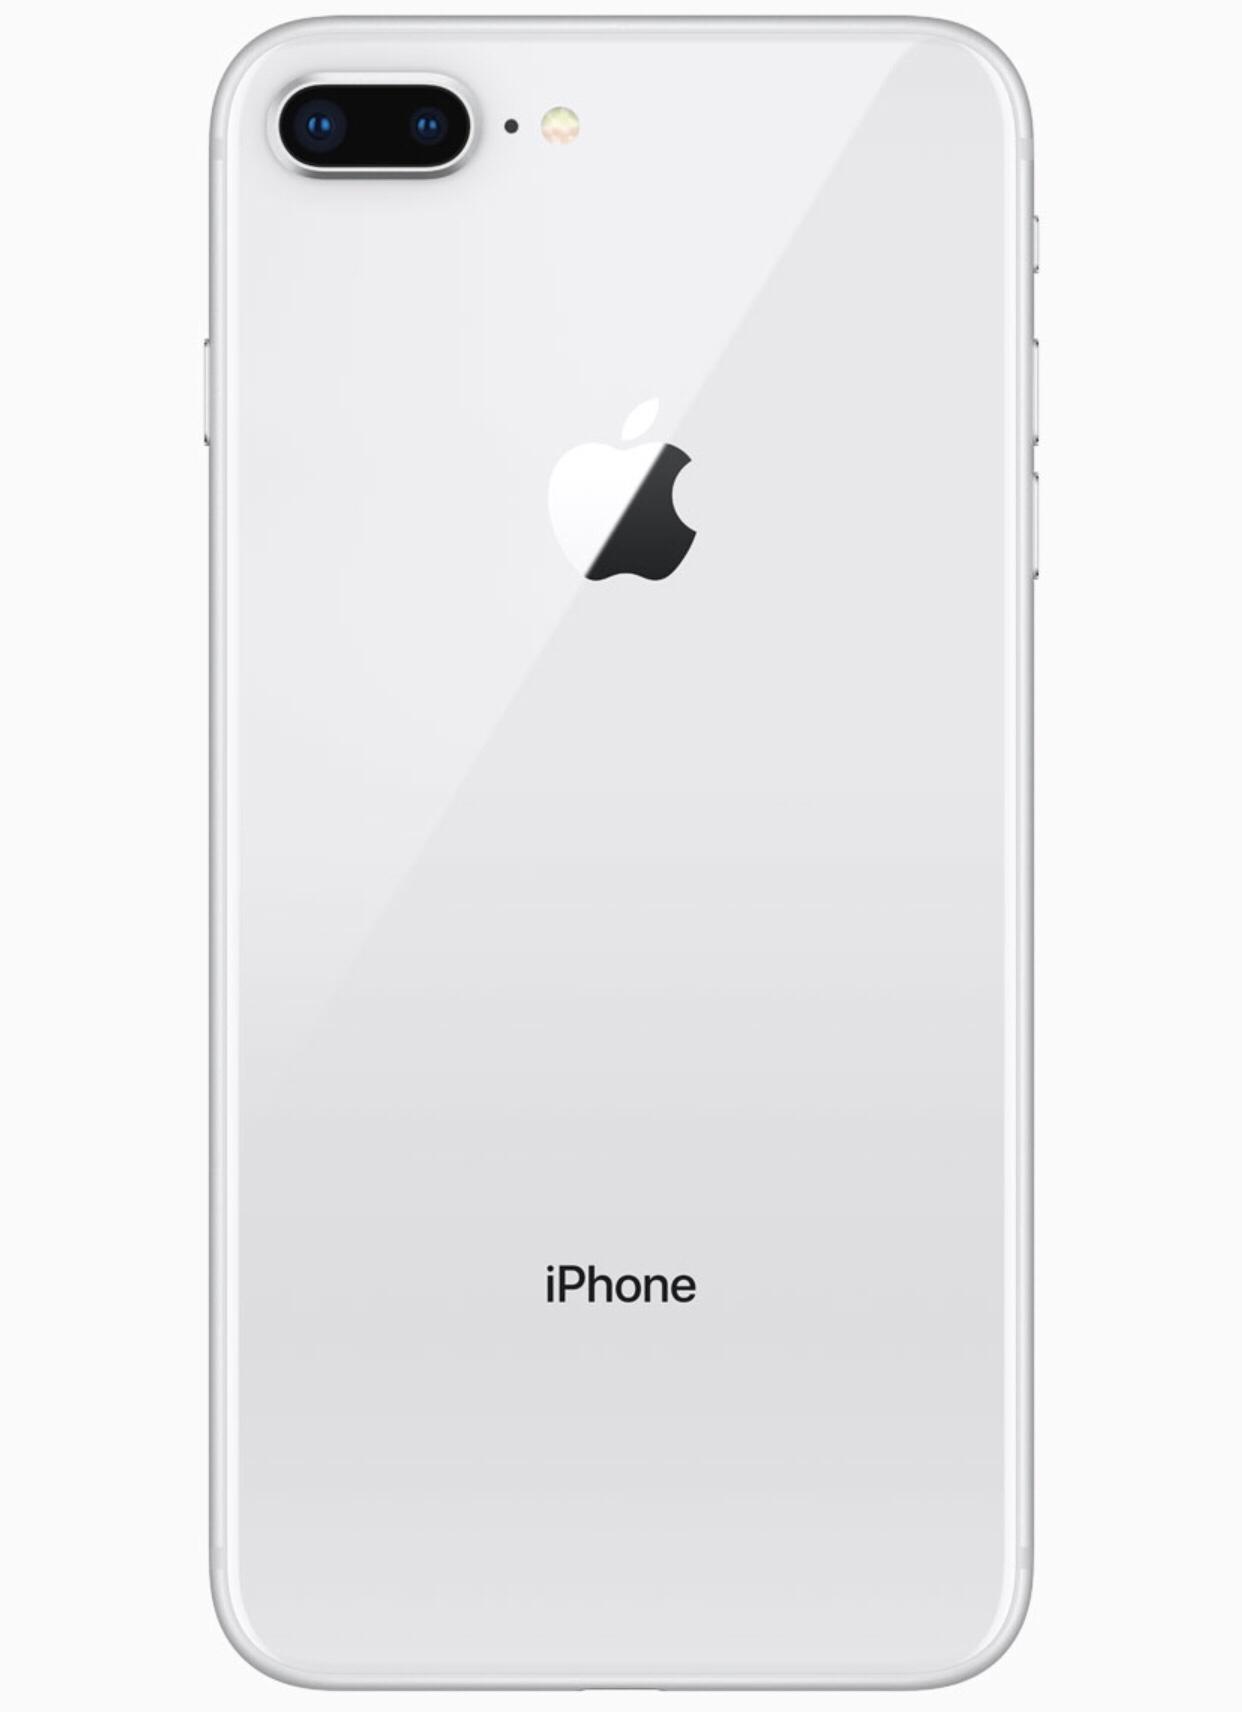 iPhone8Plus 256GB SIMフリー版でMVNOデビュー